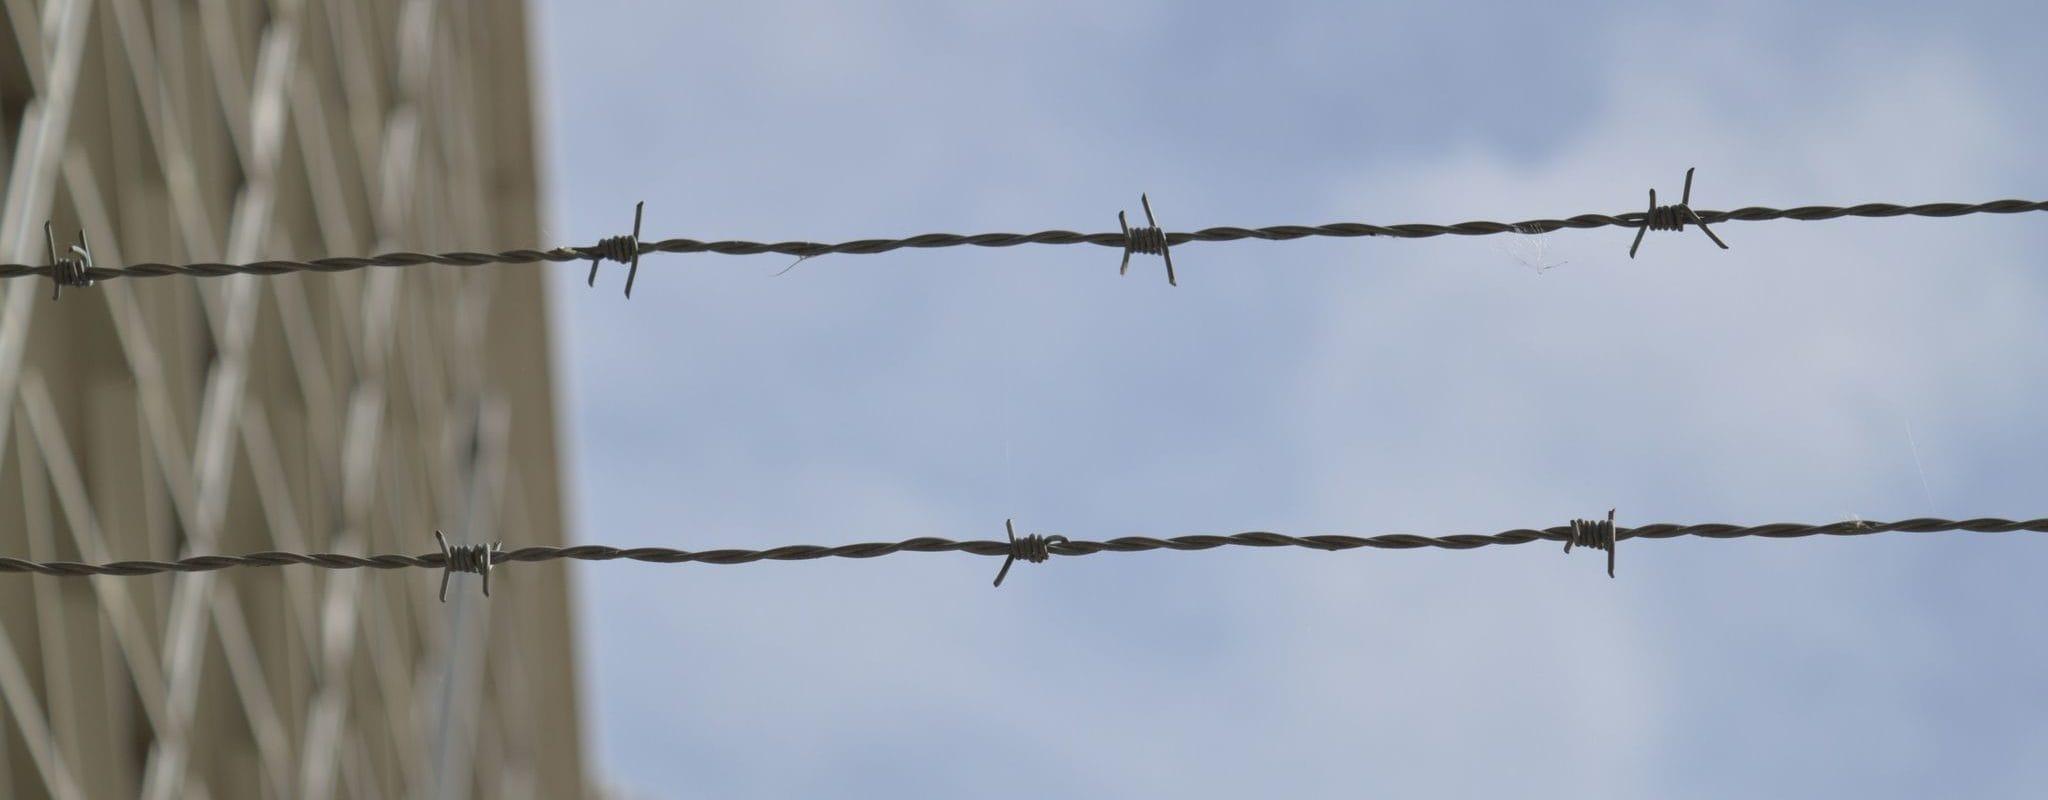 La prison prévue à Strasbourg sera construite à Colmar